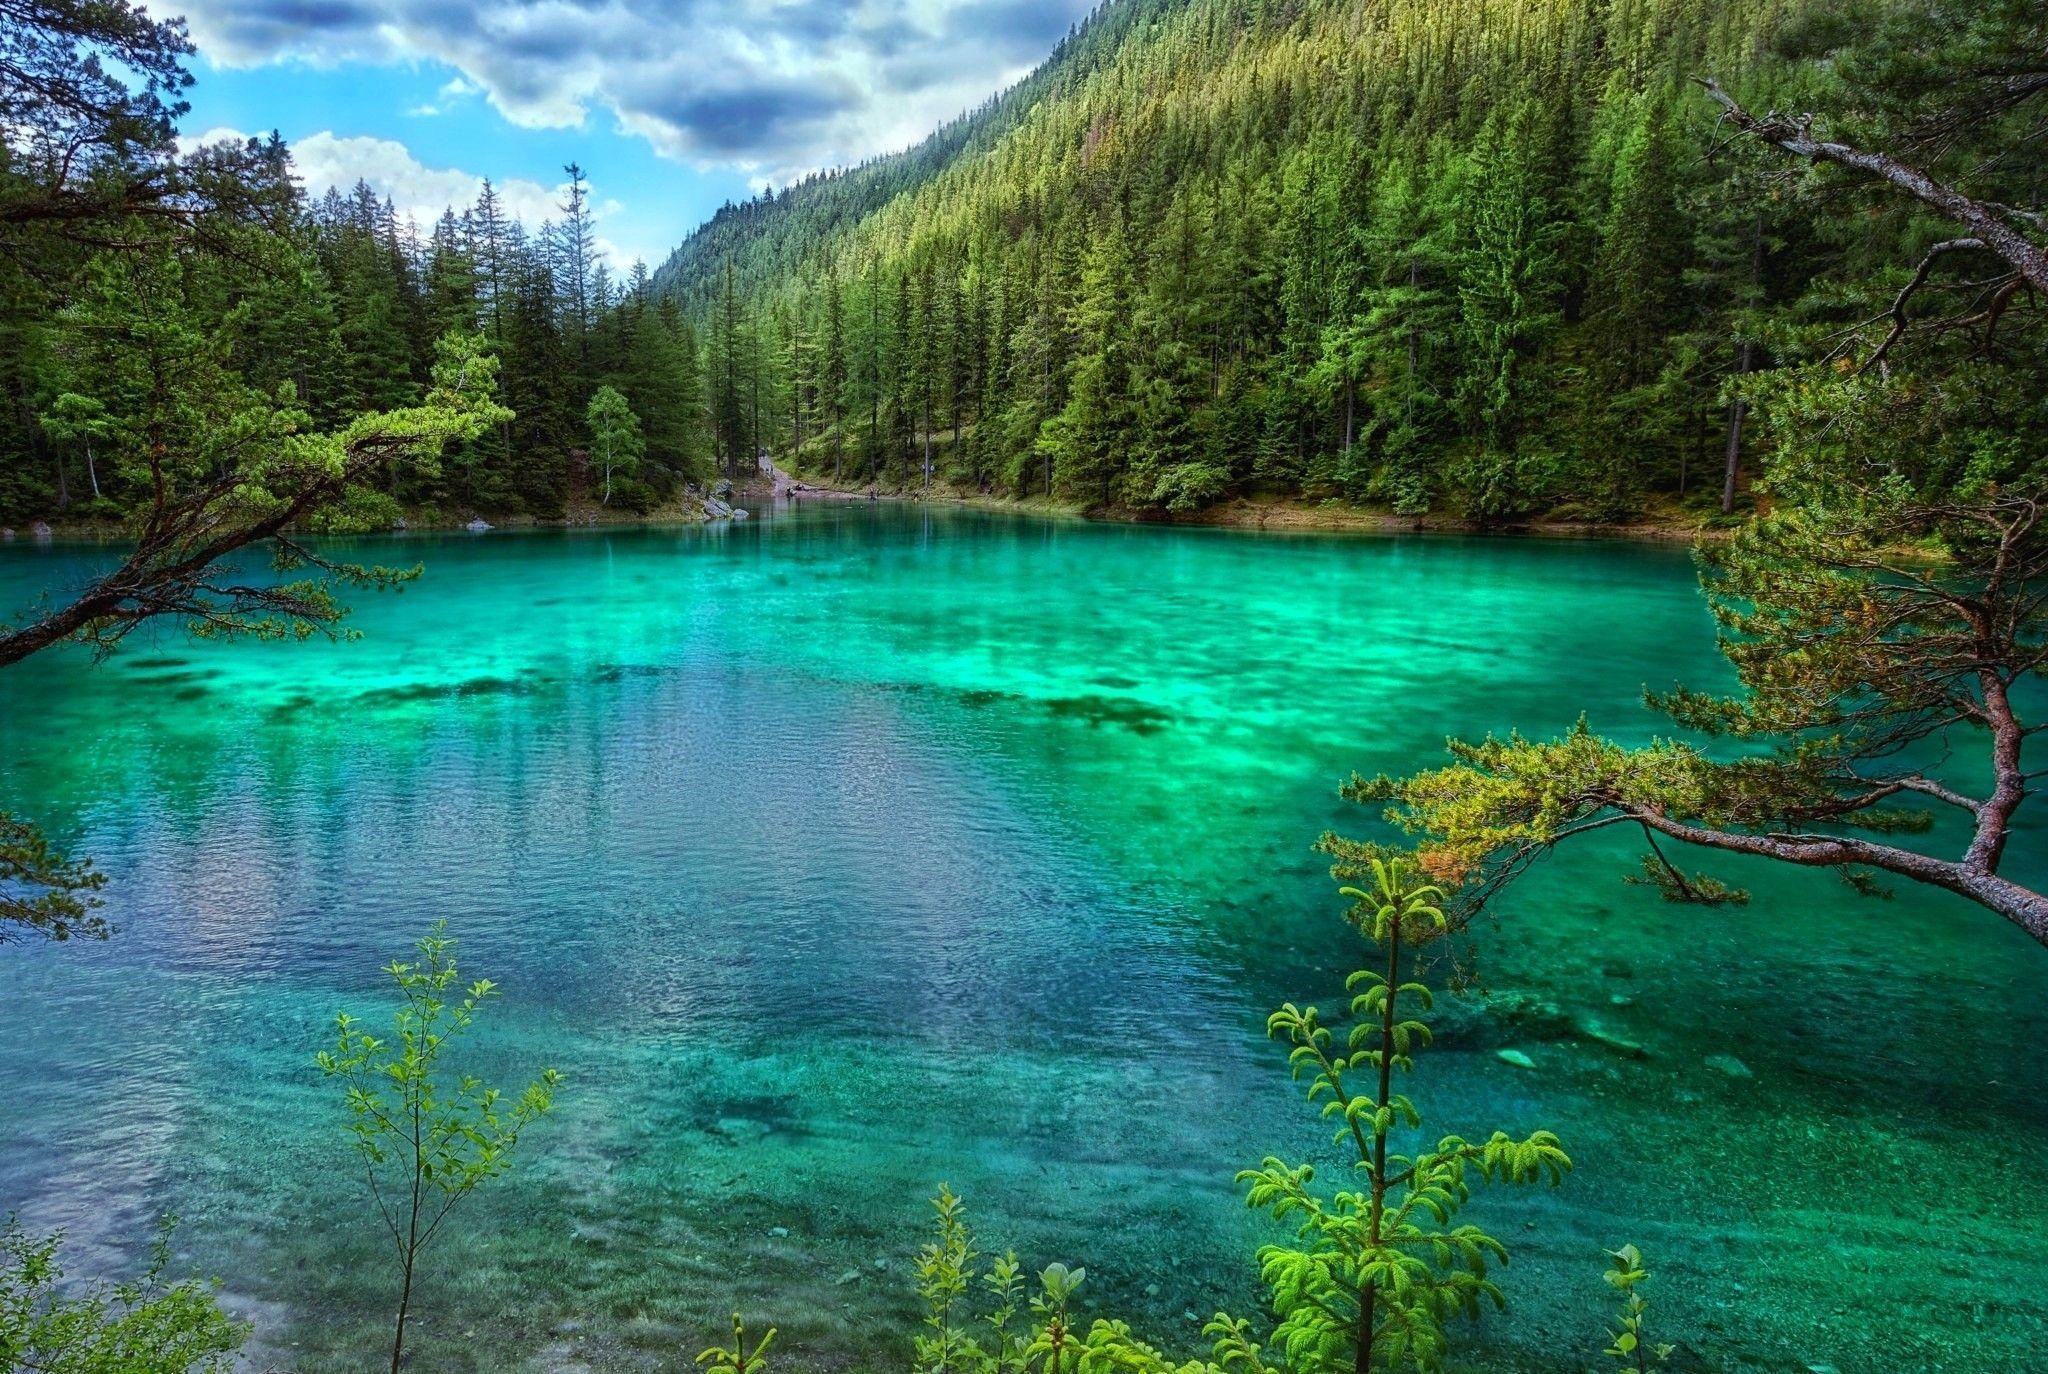 Green Lake Wallpapers - Top Free Green Lake Backgrounds - WallpaperAccess